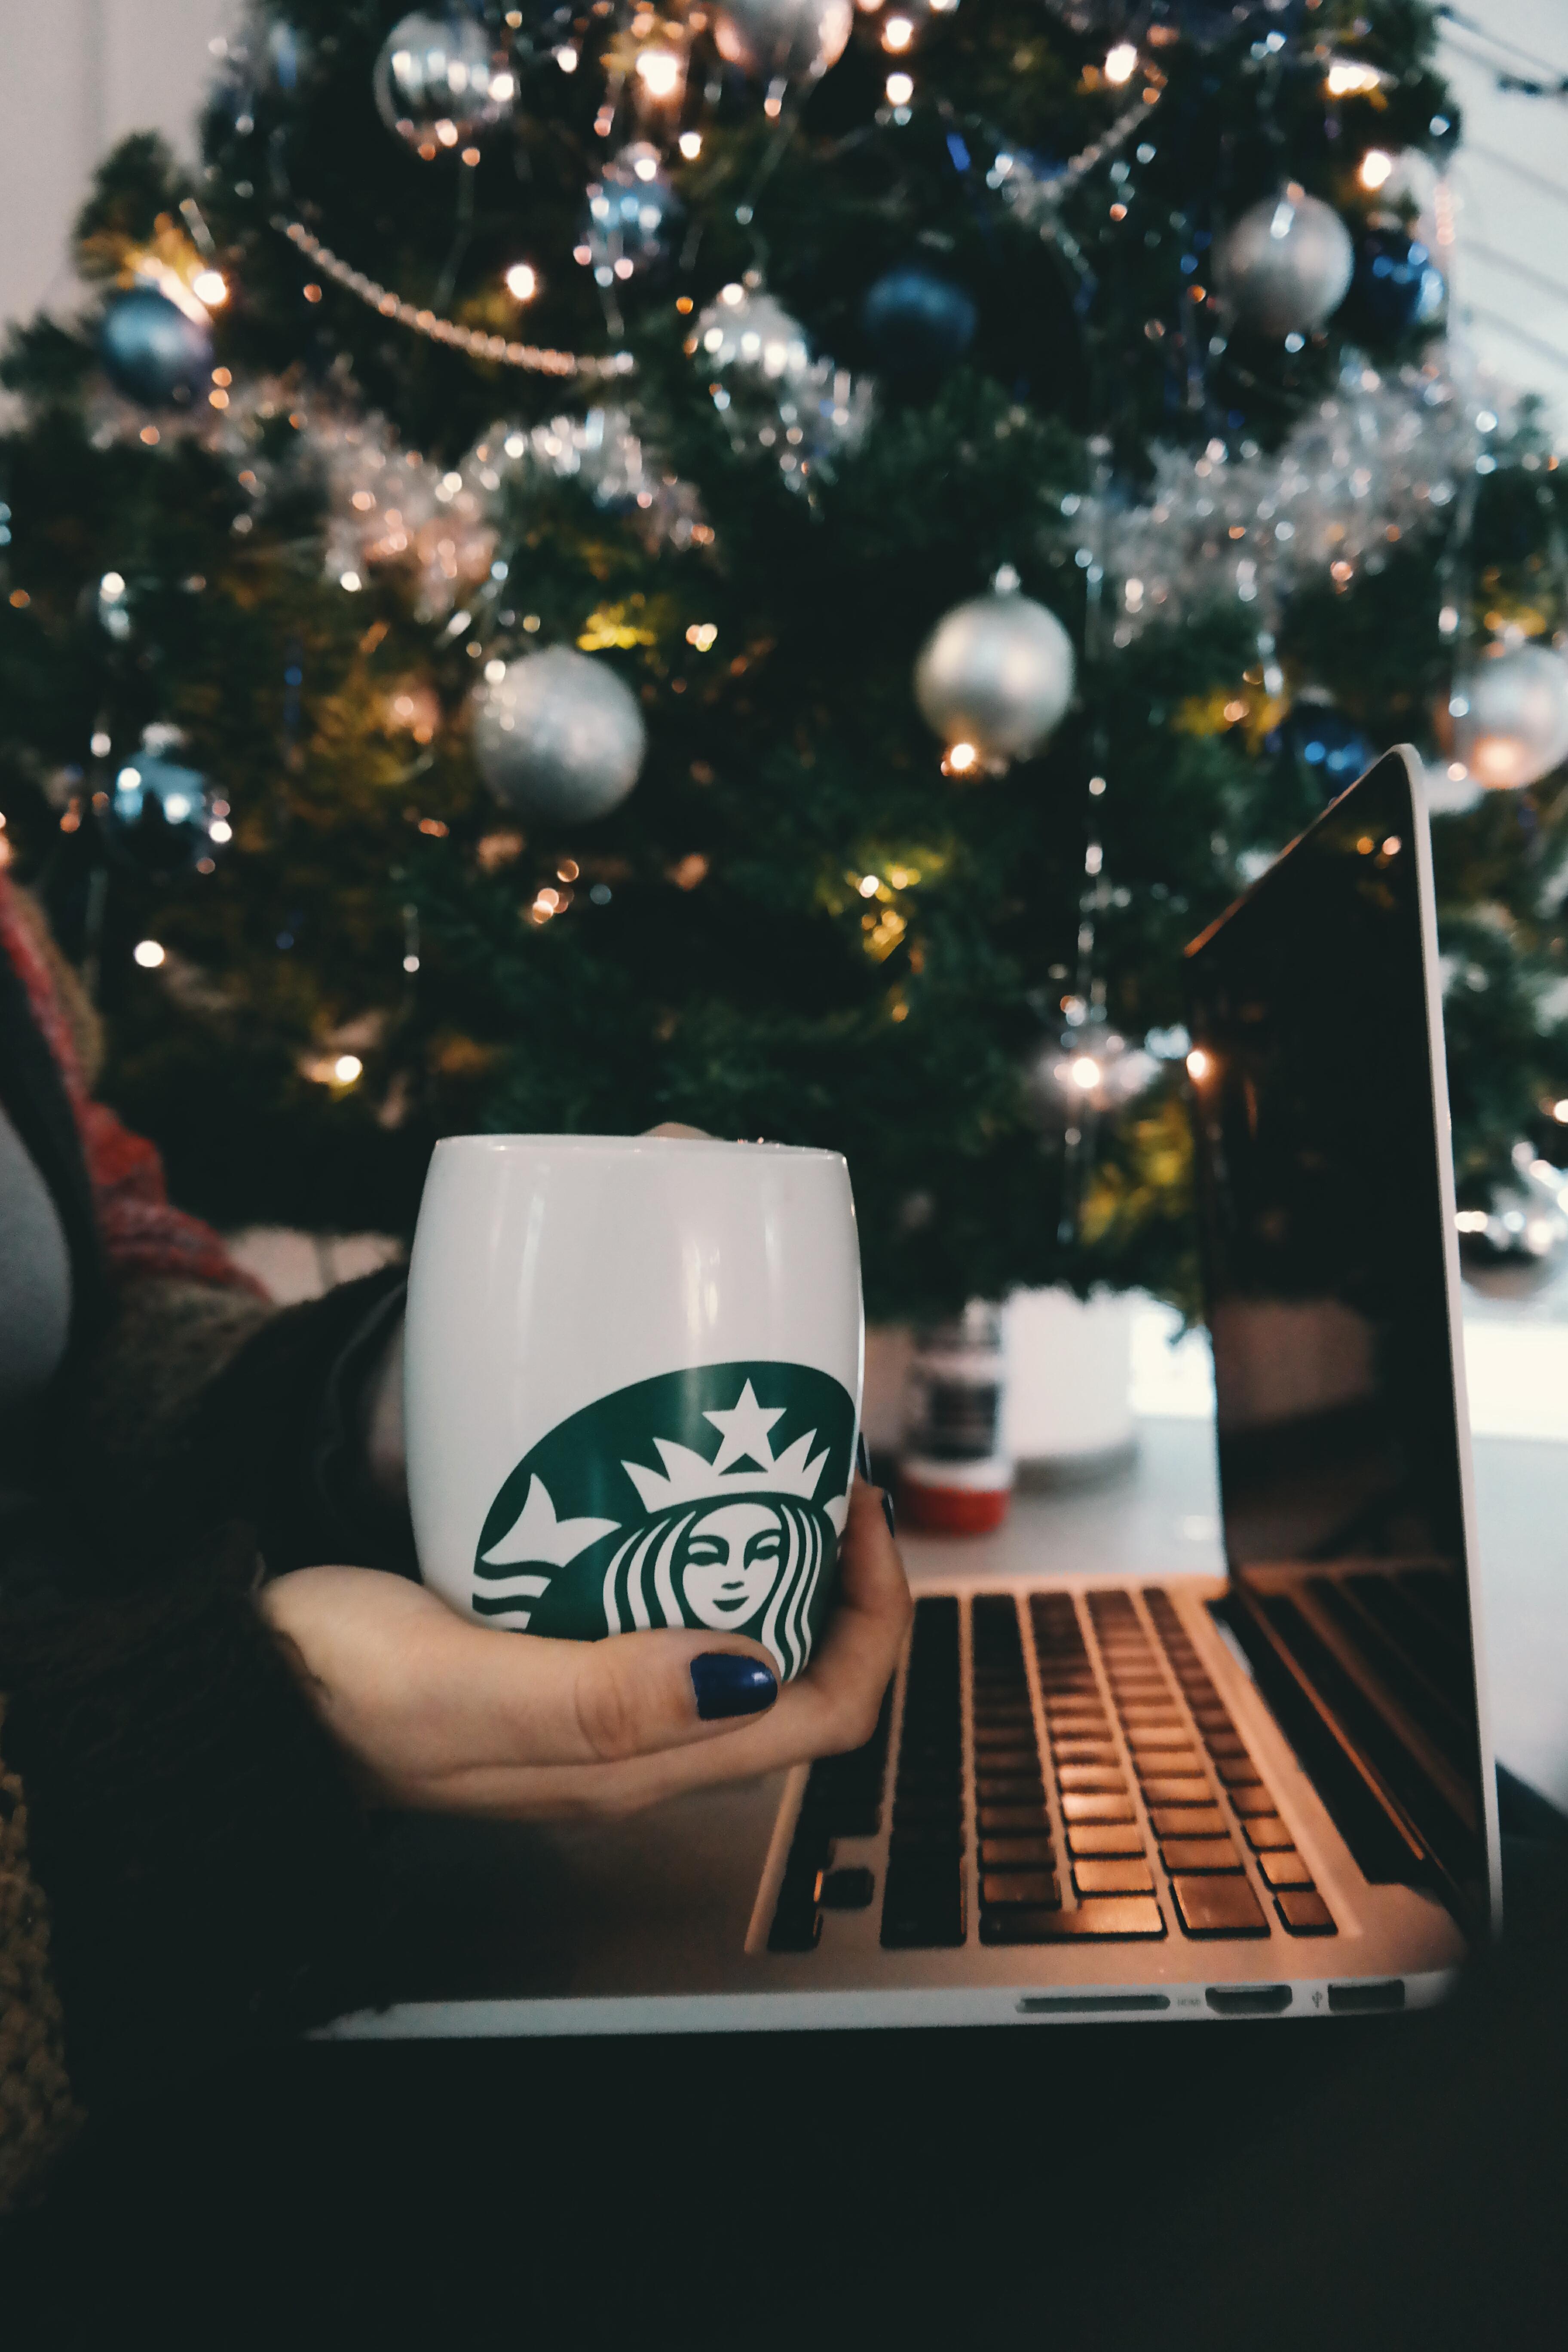 Coffee Christmas Tree.Free Images Laptop Computer Macbook Hand Coffee